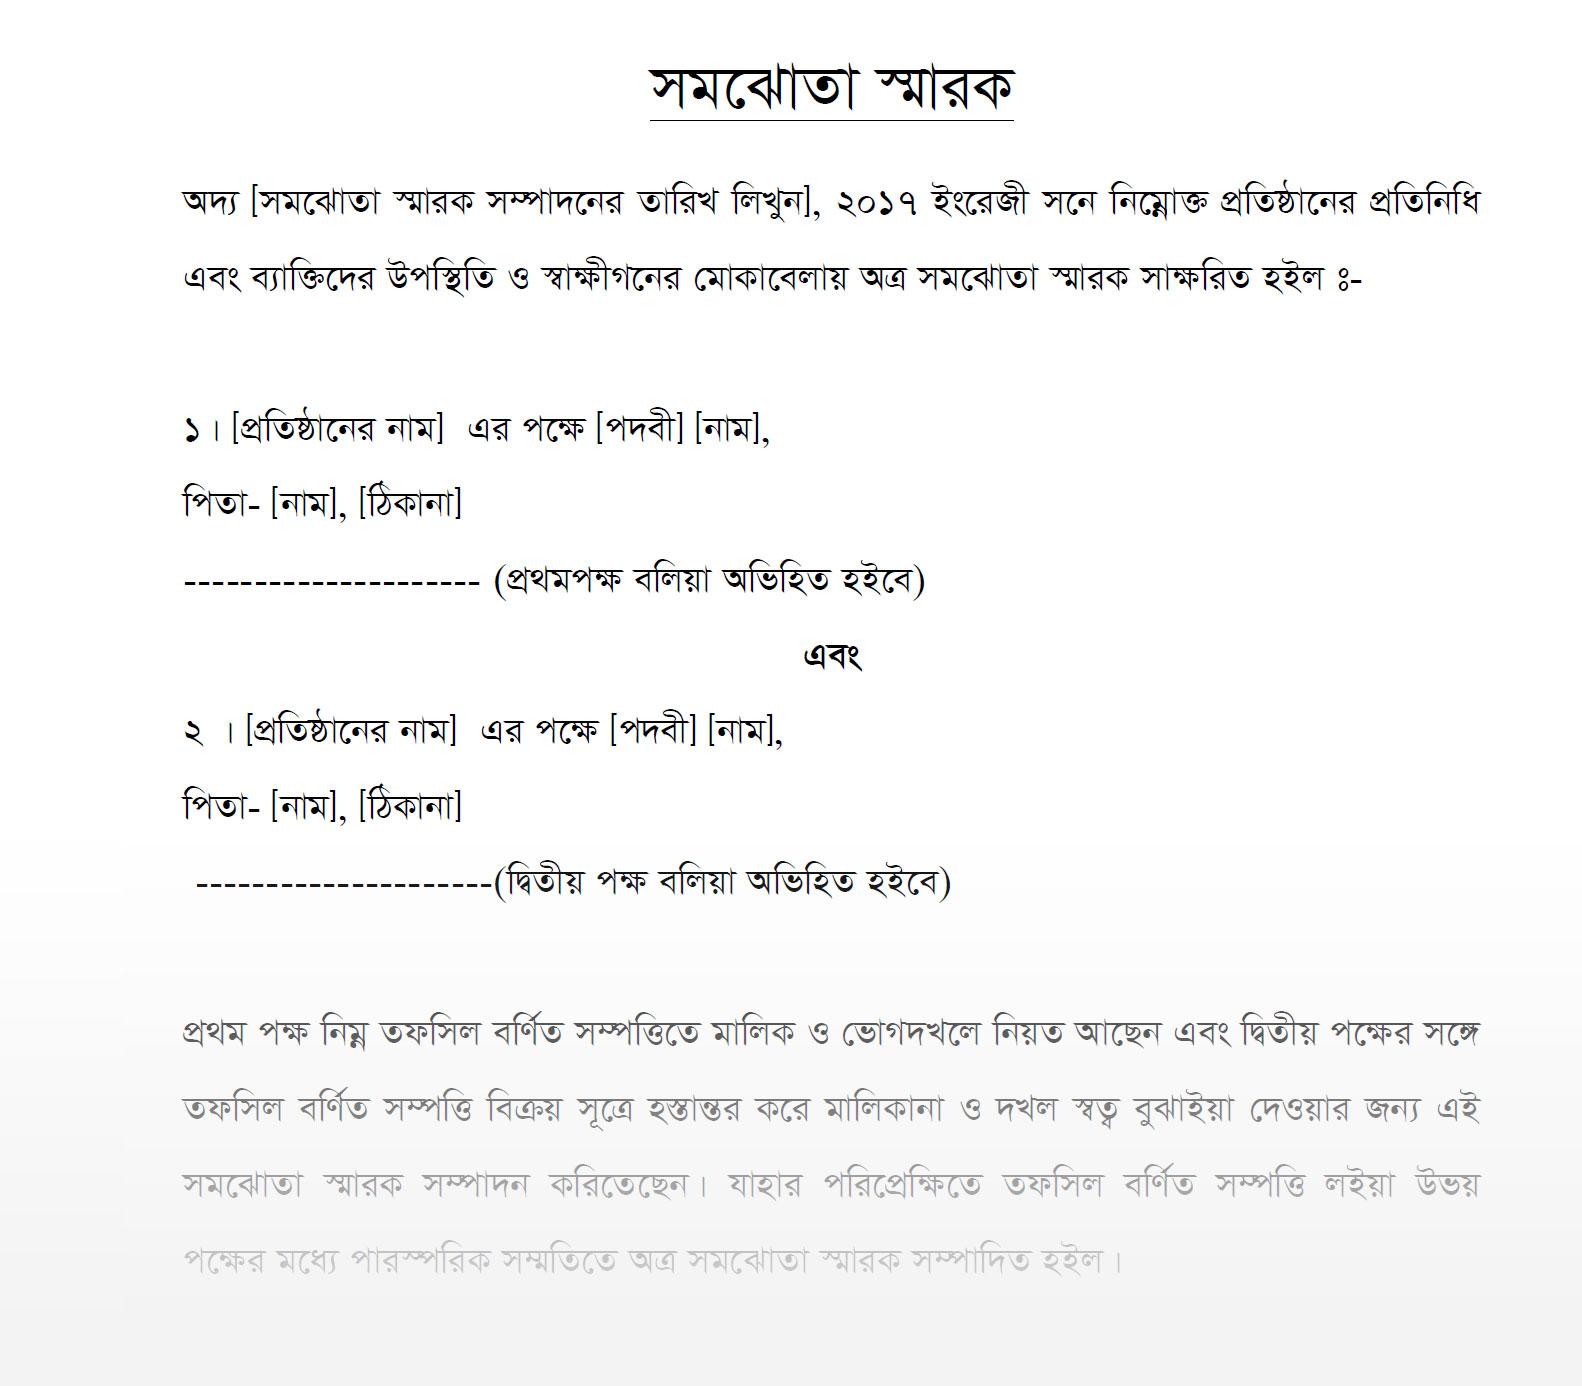 Sample MOU Between Buyer And Seller (In Bangla) | Life in